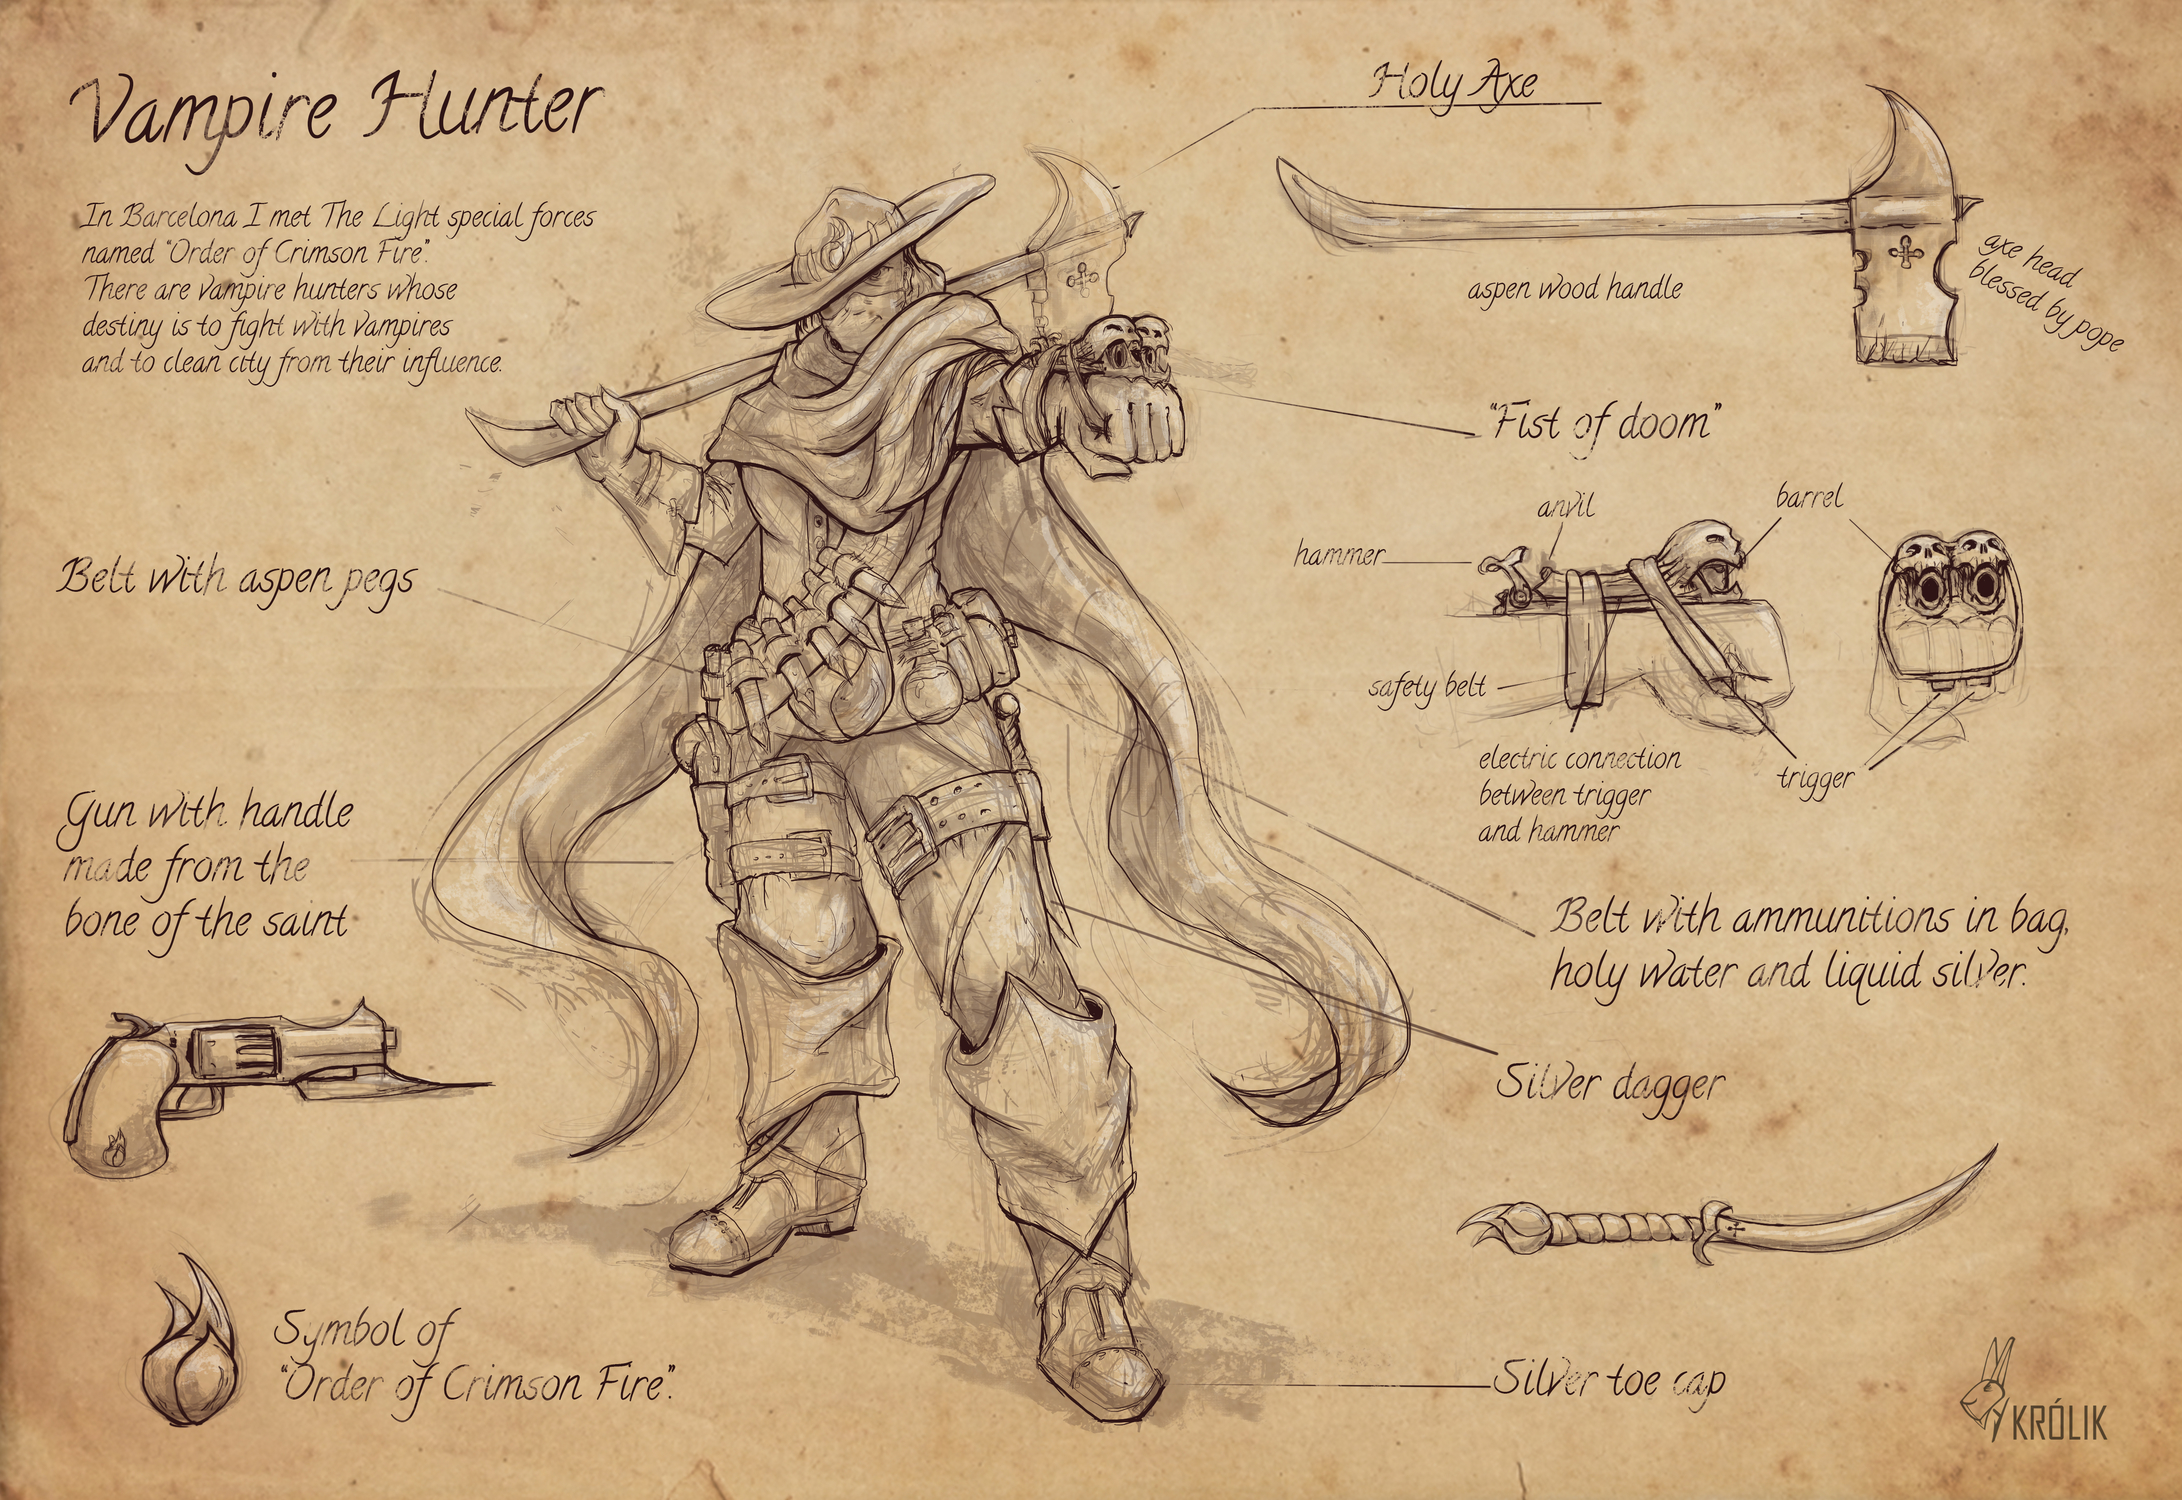 Vampire Hunter (Barcelona) Artwork by Wojciech Królik